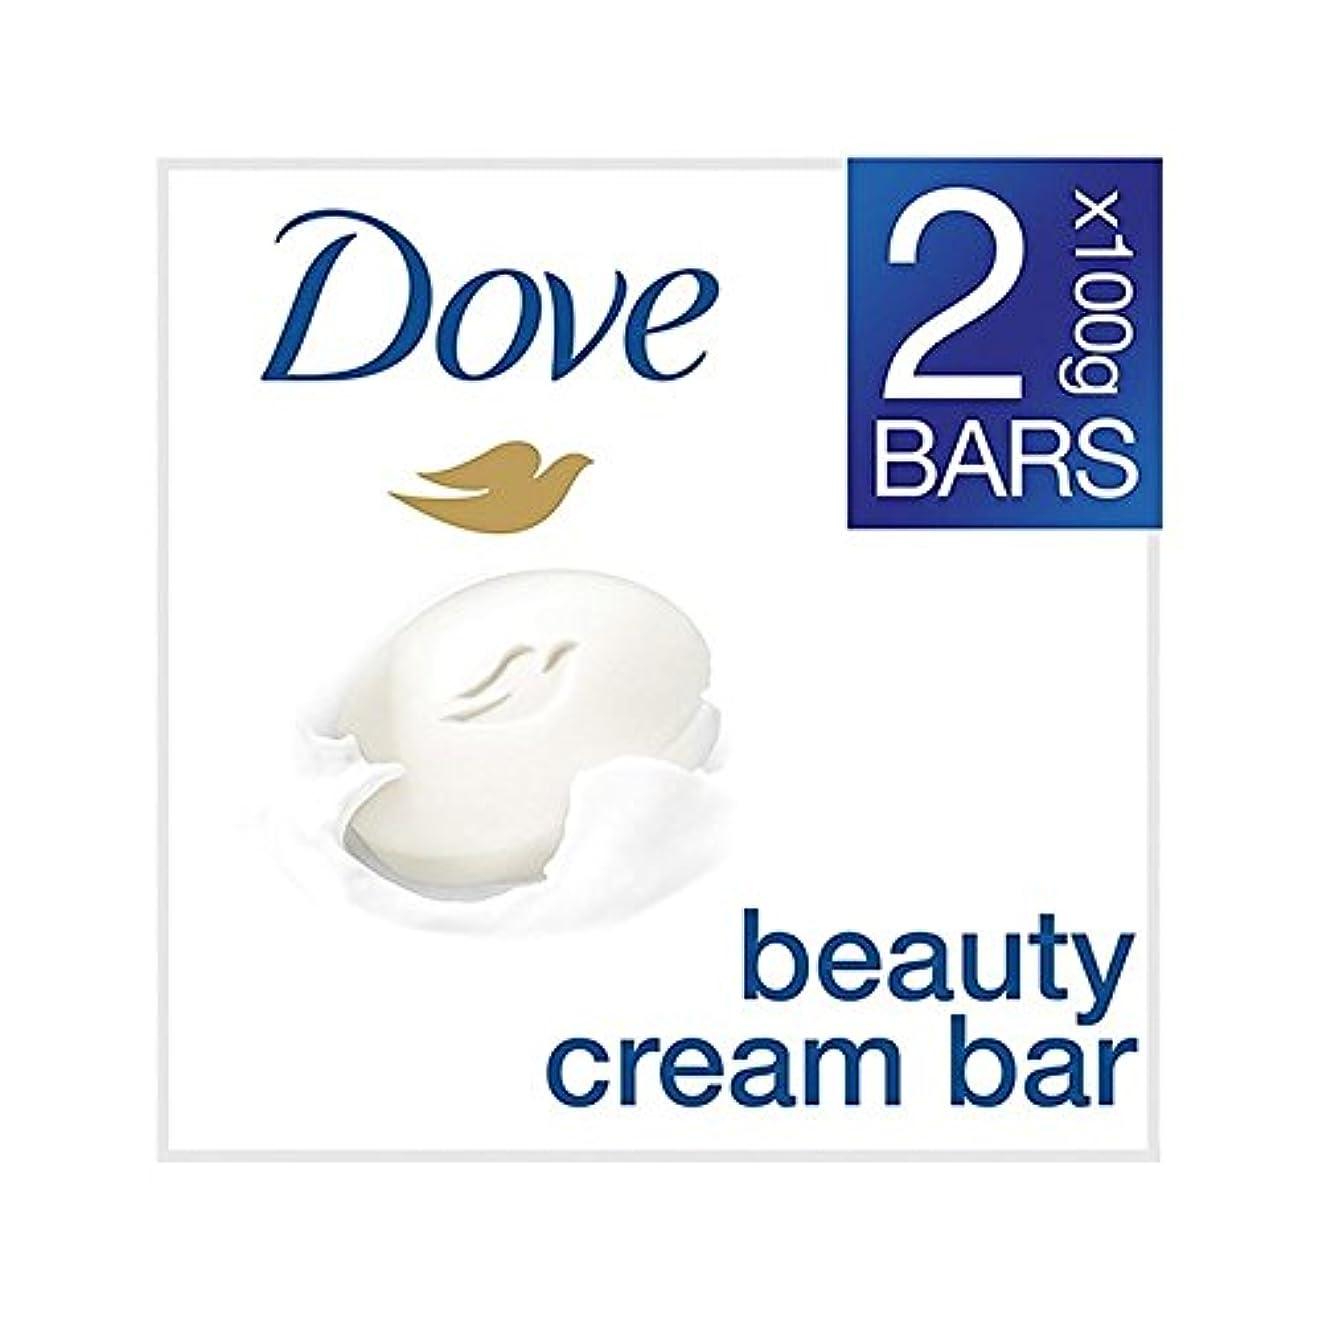 [Dove ] 鳩の美容クリームバーオリジナルの2×100グラム - Dove Beauty Cream Bar Original 2 x 100g [並行輸入品]